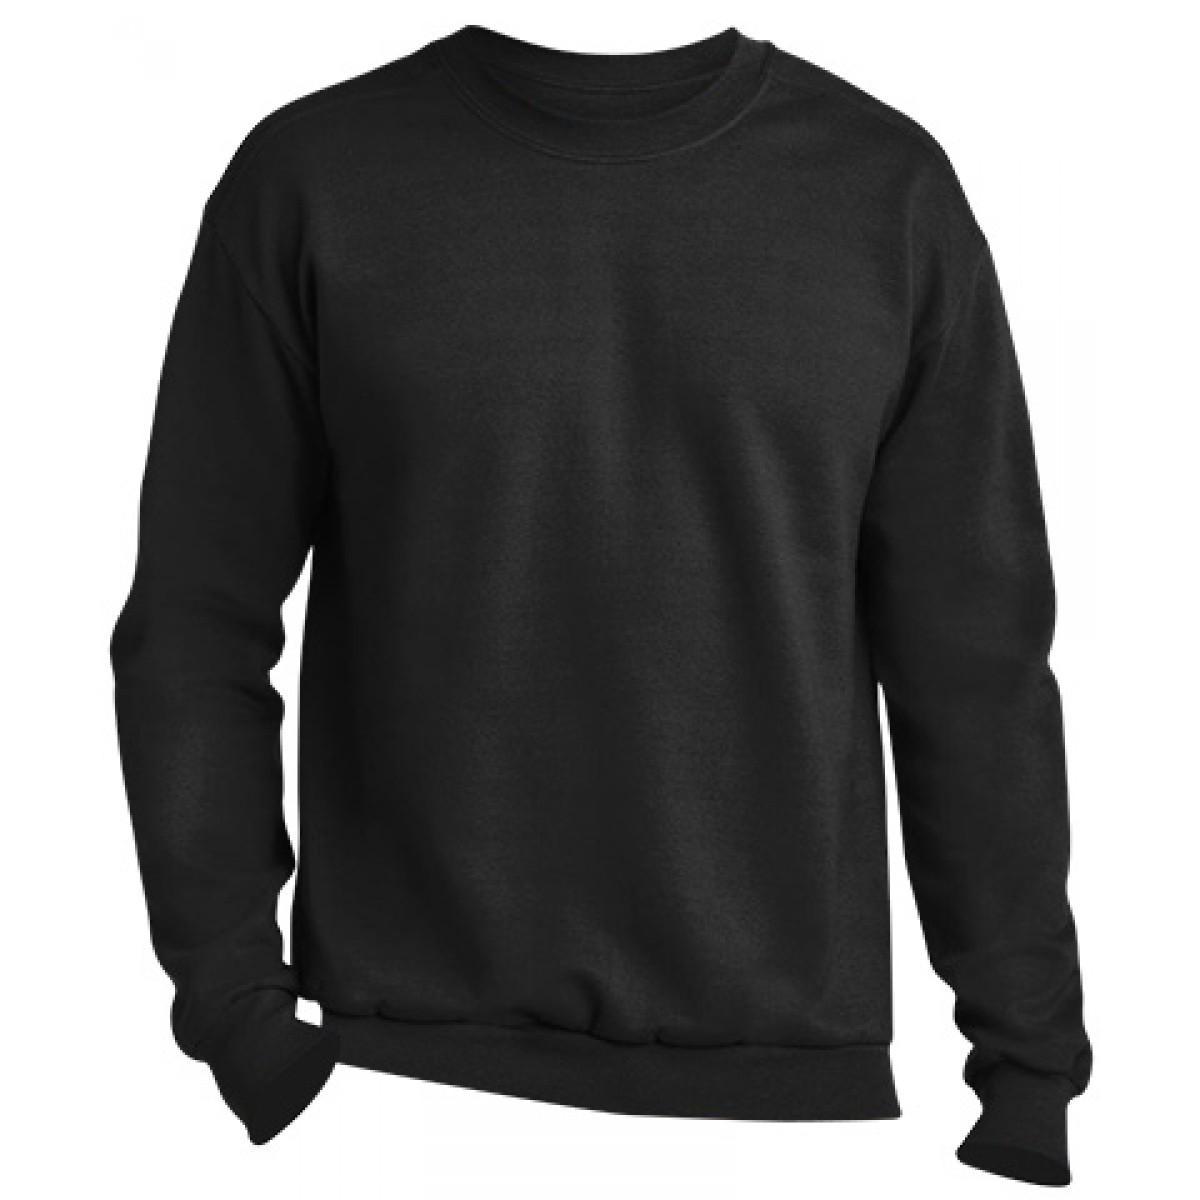 Crewneck Sweater -Black-L